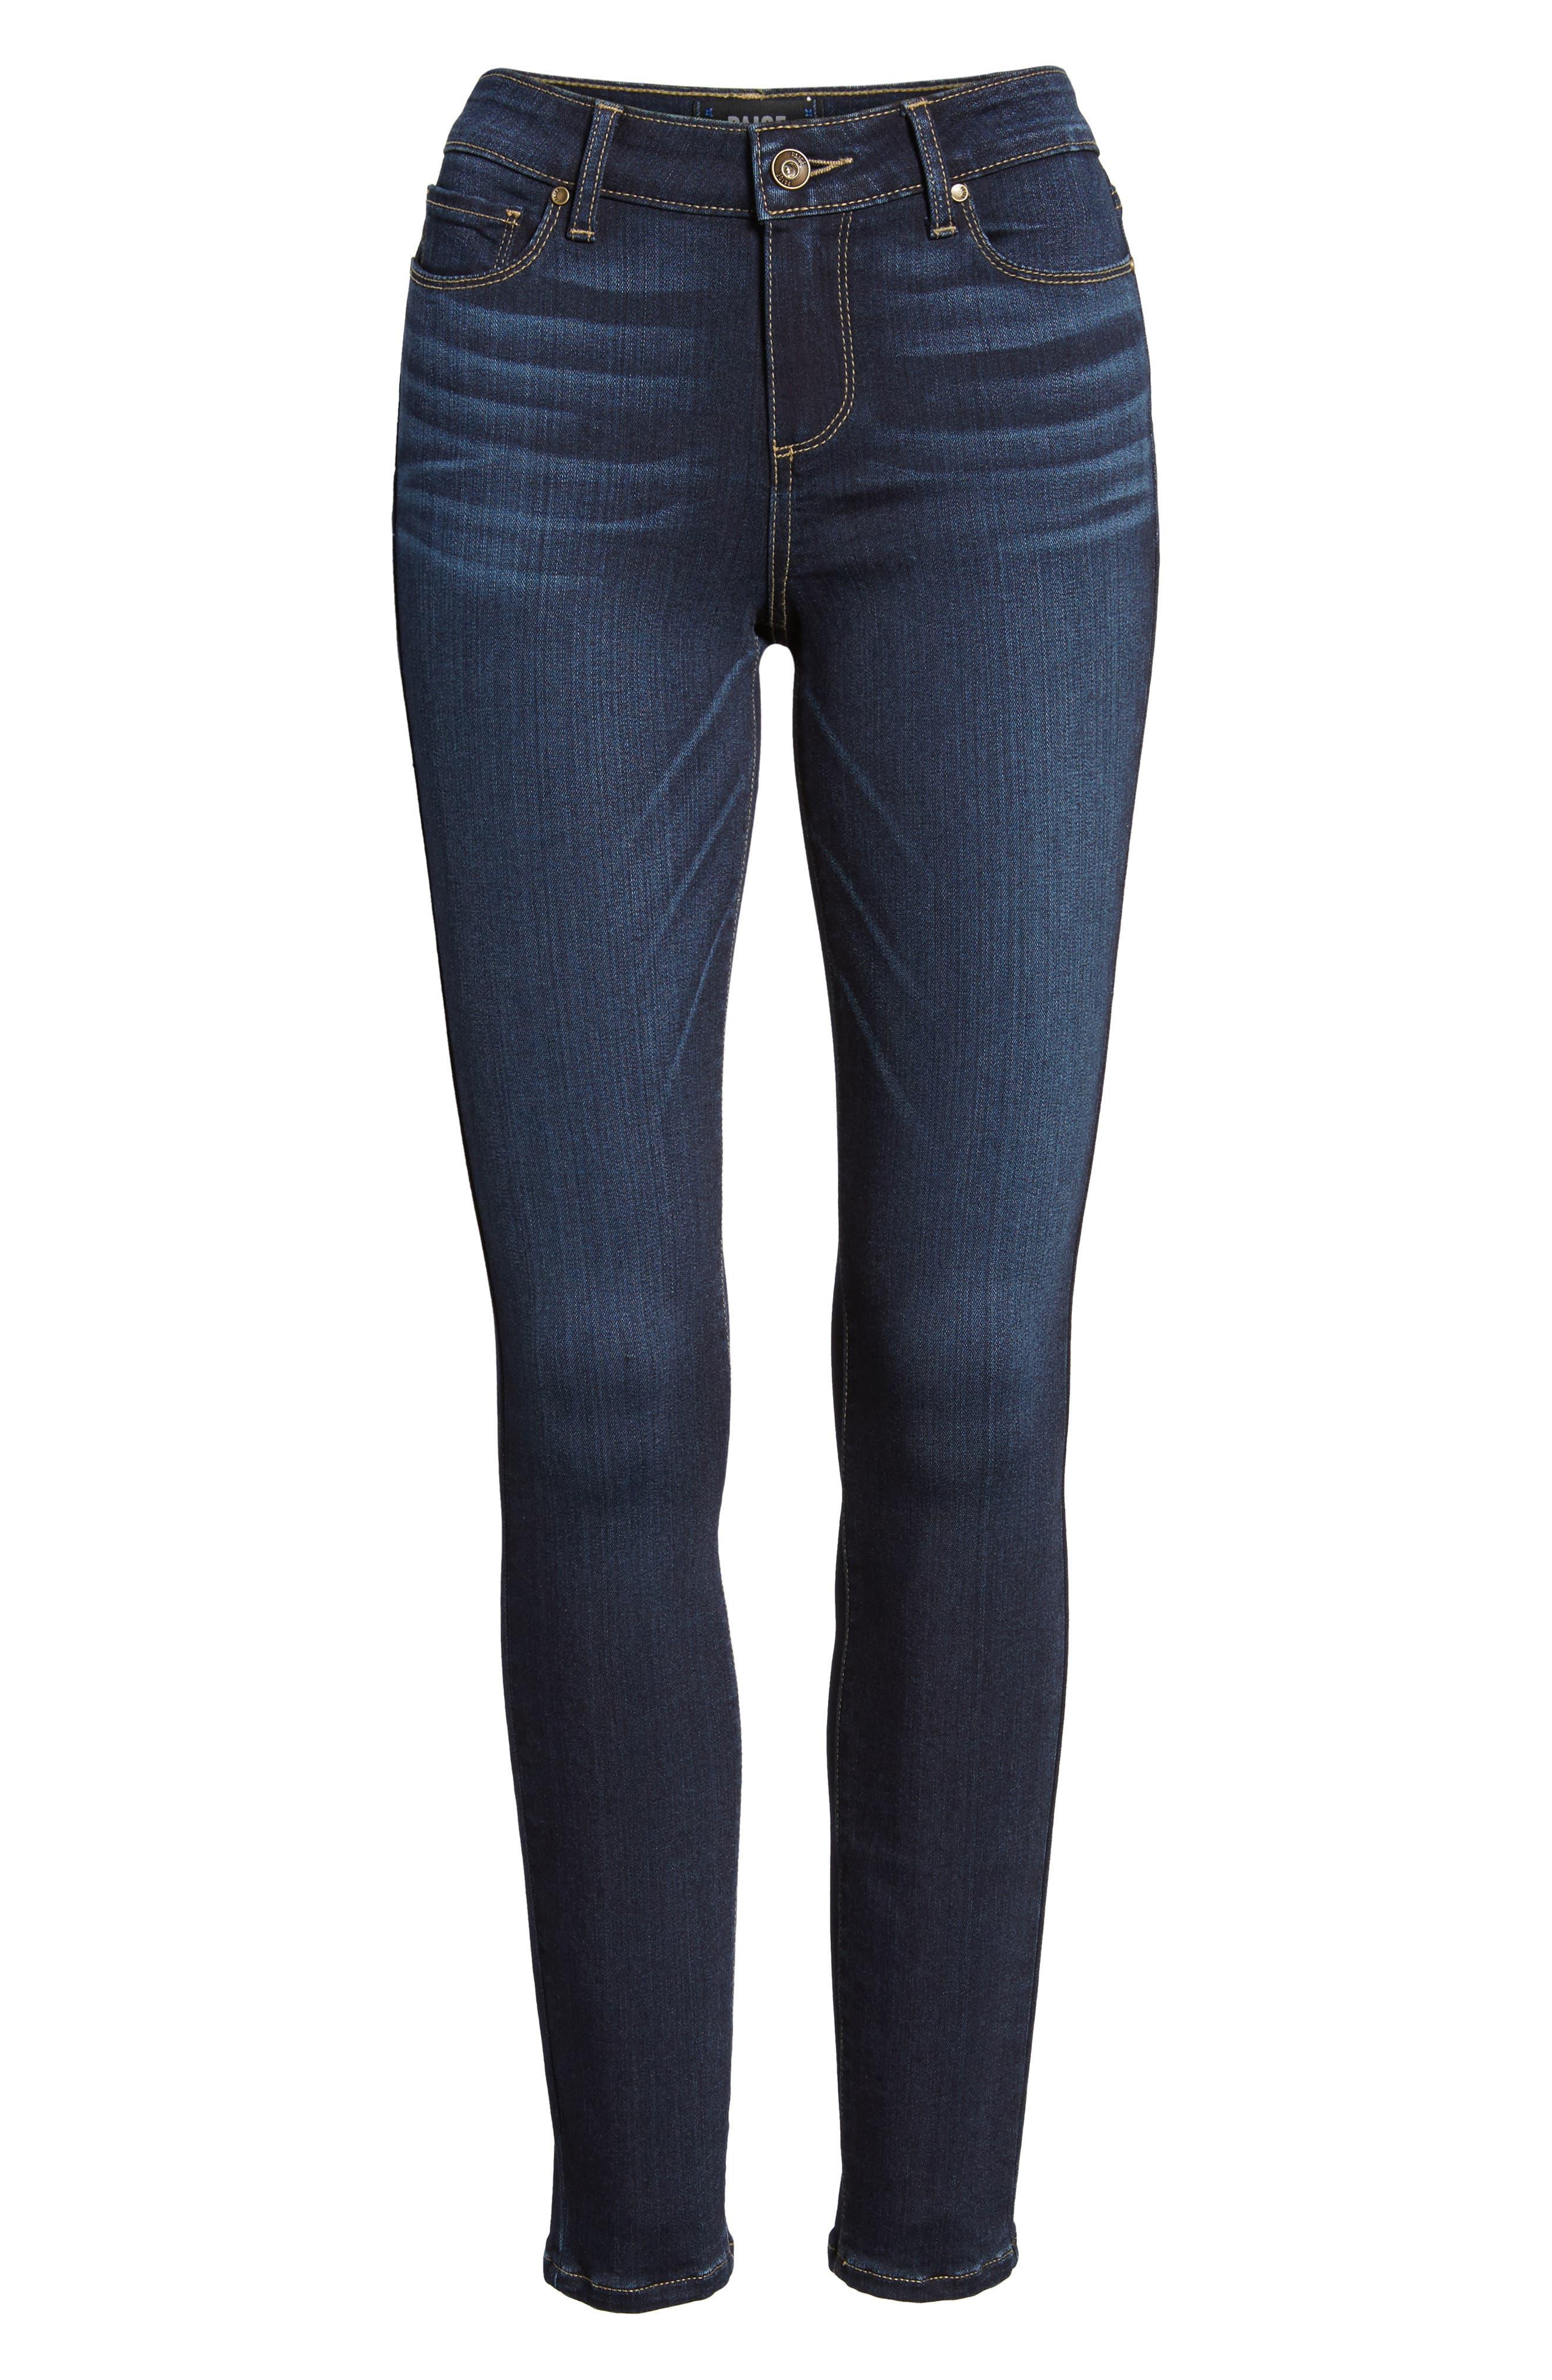 Transcend - Verdugo Ultra Skinny Jeans,                             Alternate thumbnail 7, color,                             400